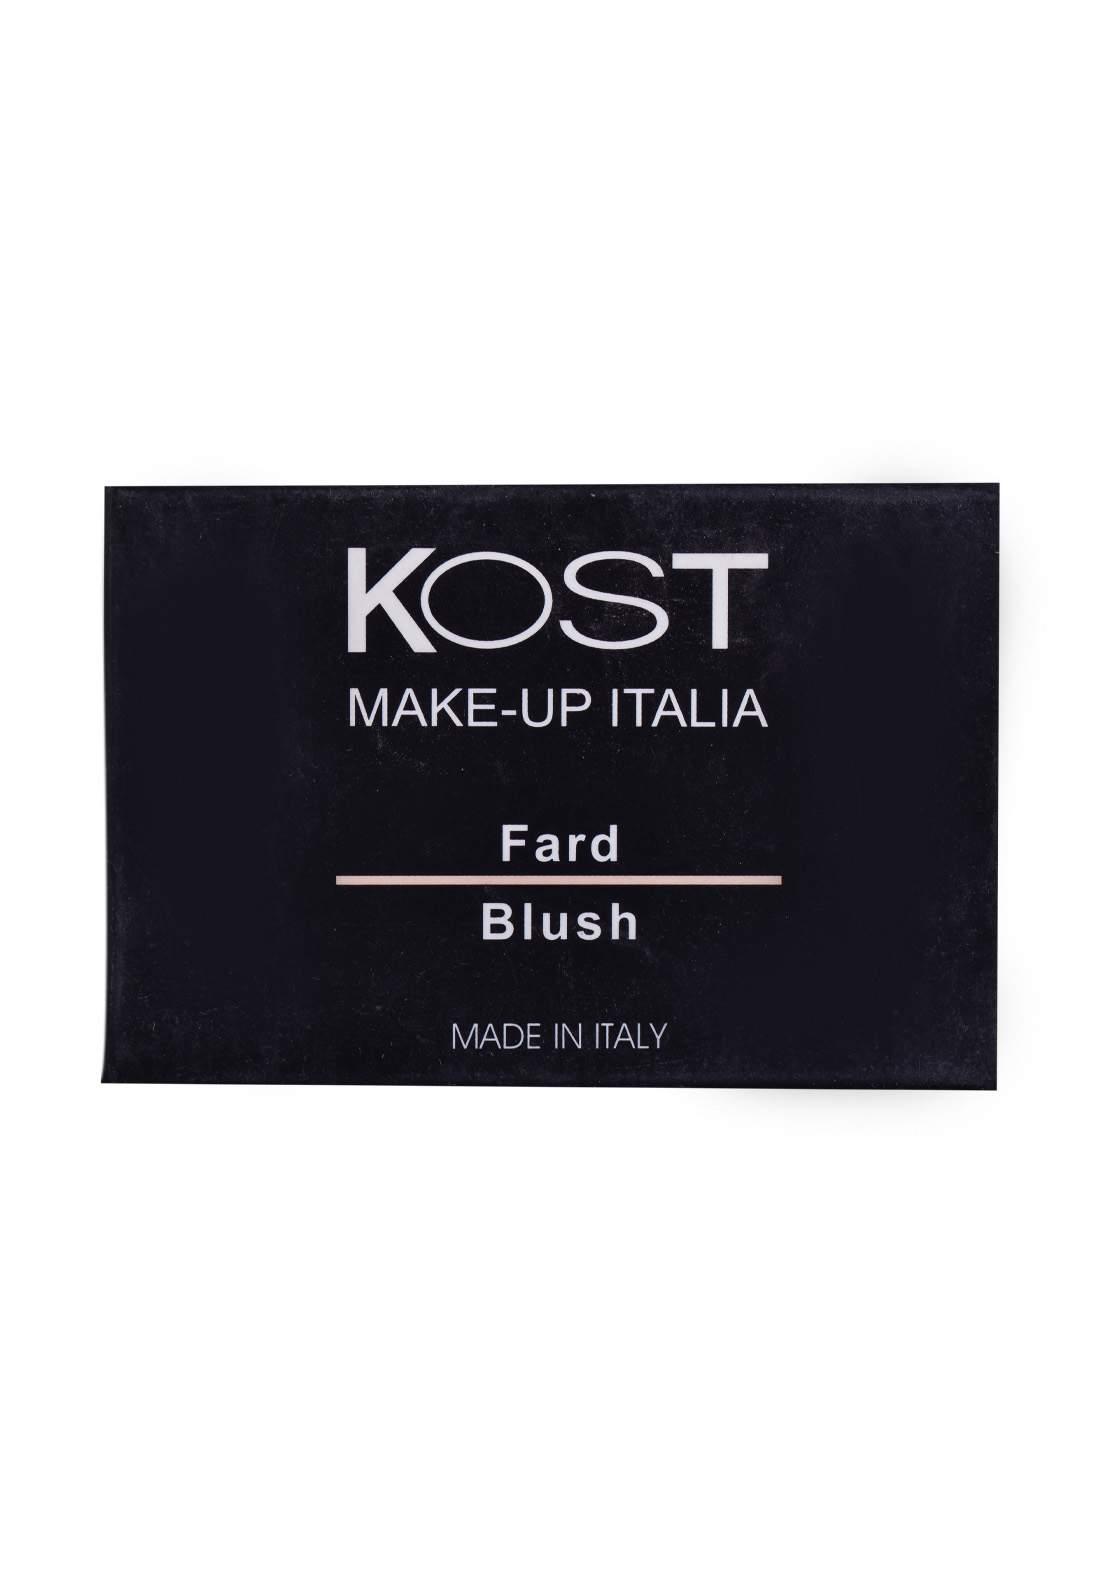 Kost Make Up Italia Fard Blush No.25 احمر خدود